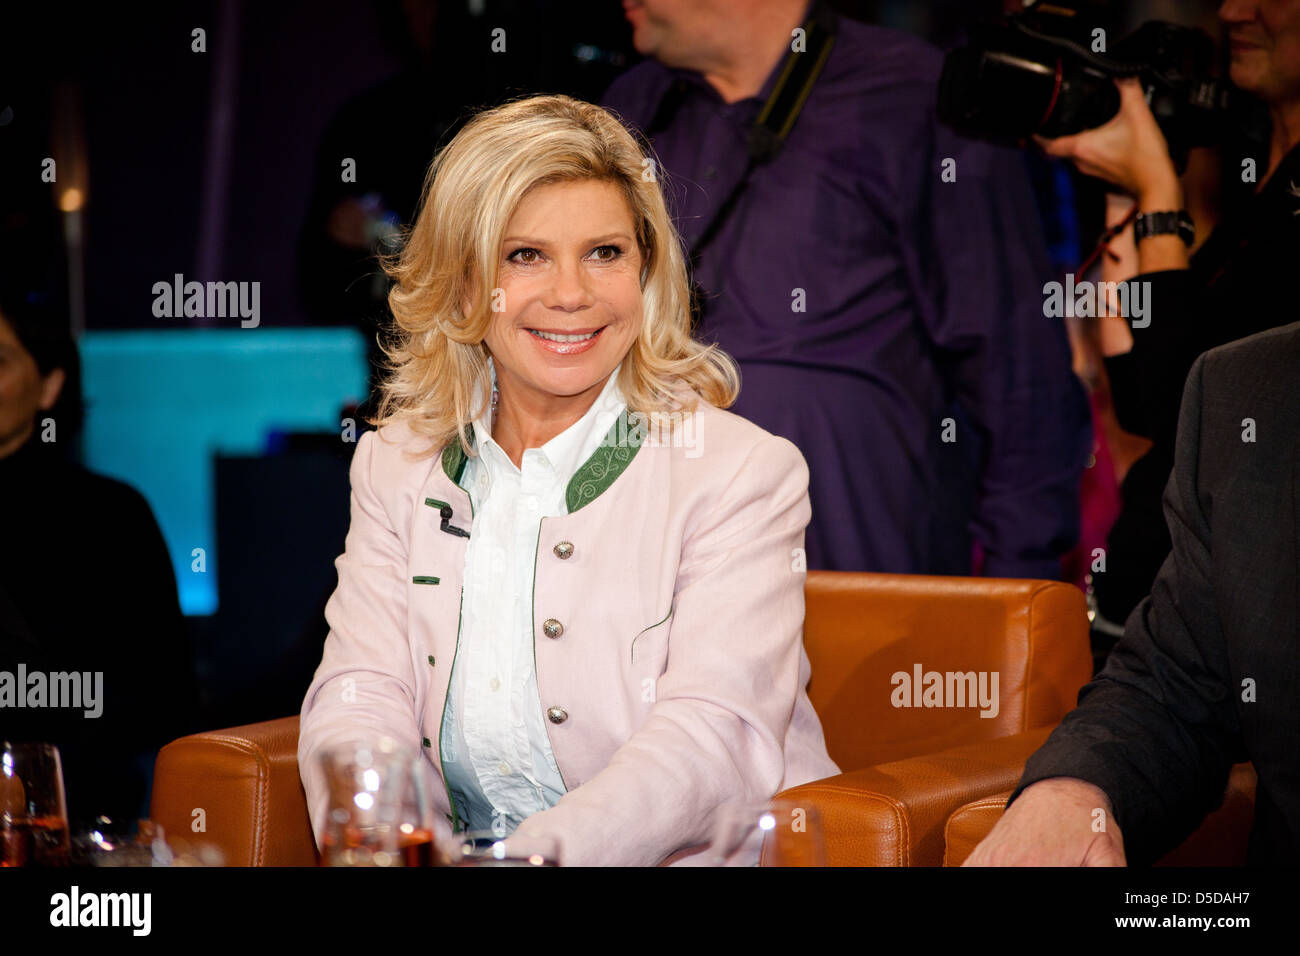 Marianne hartl stockfotos marianne hartl bilder alamy for Moderatoren ndr talkshow